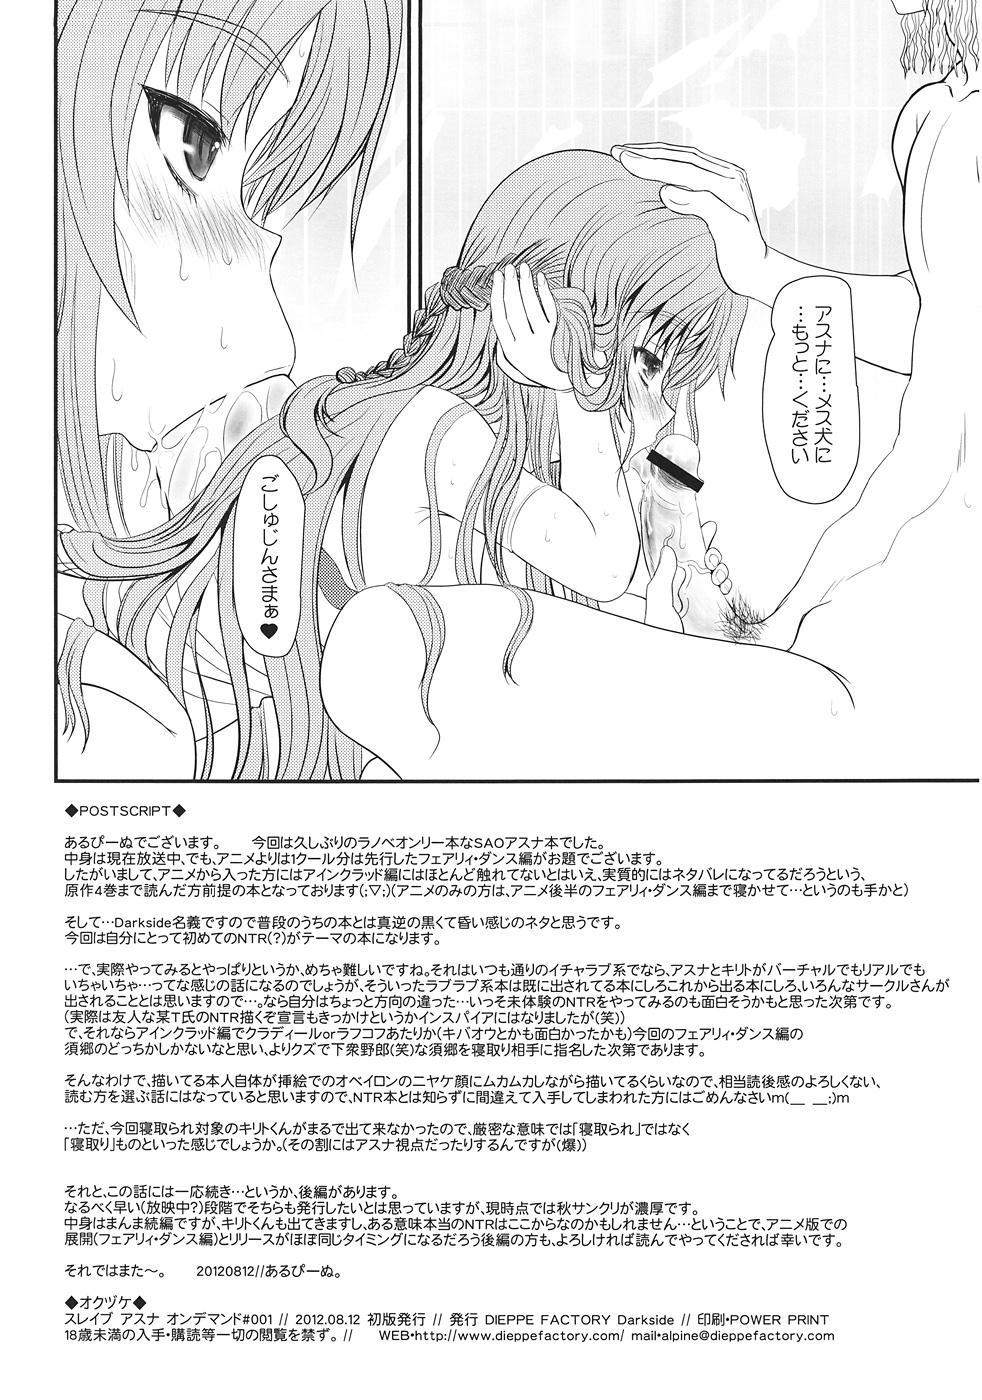 Slave Asuna On-Demand 32